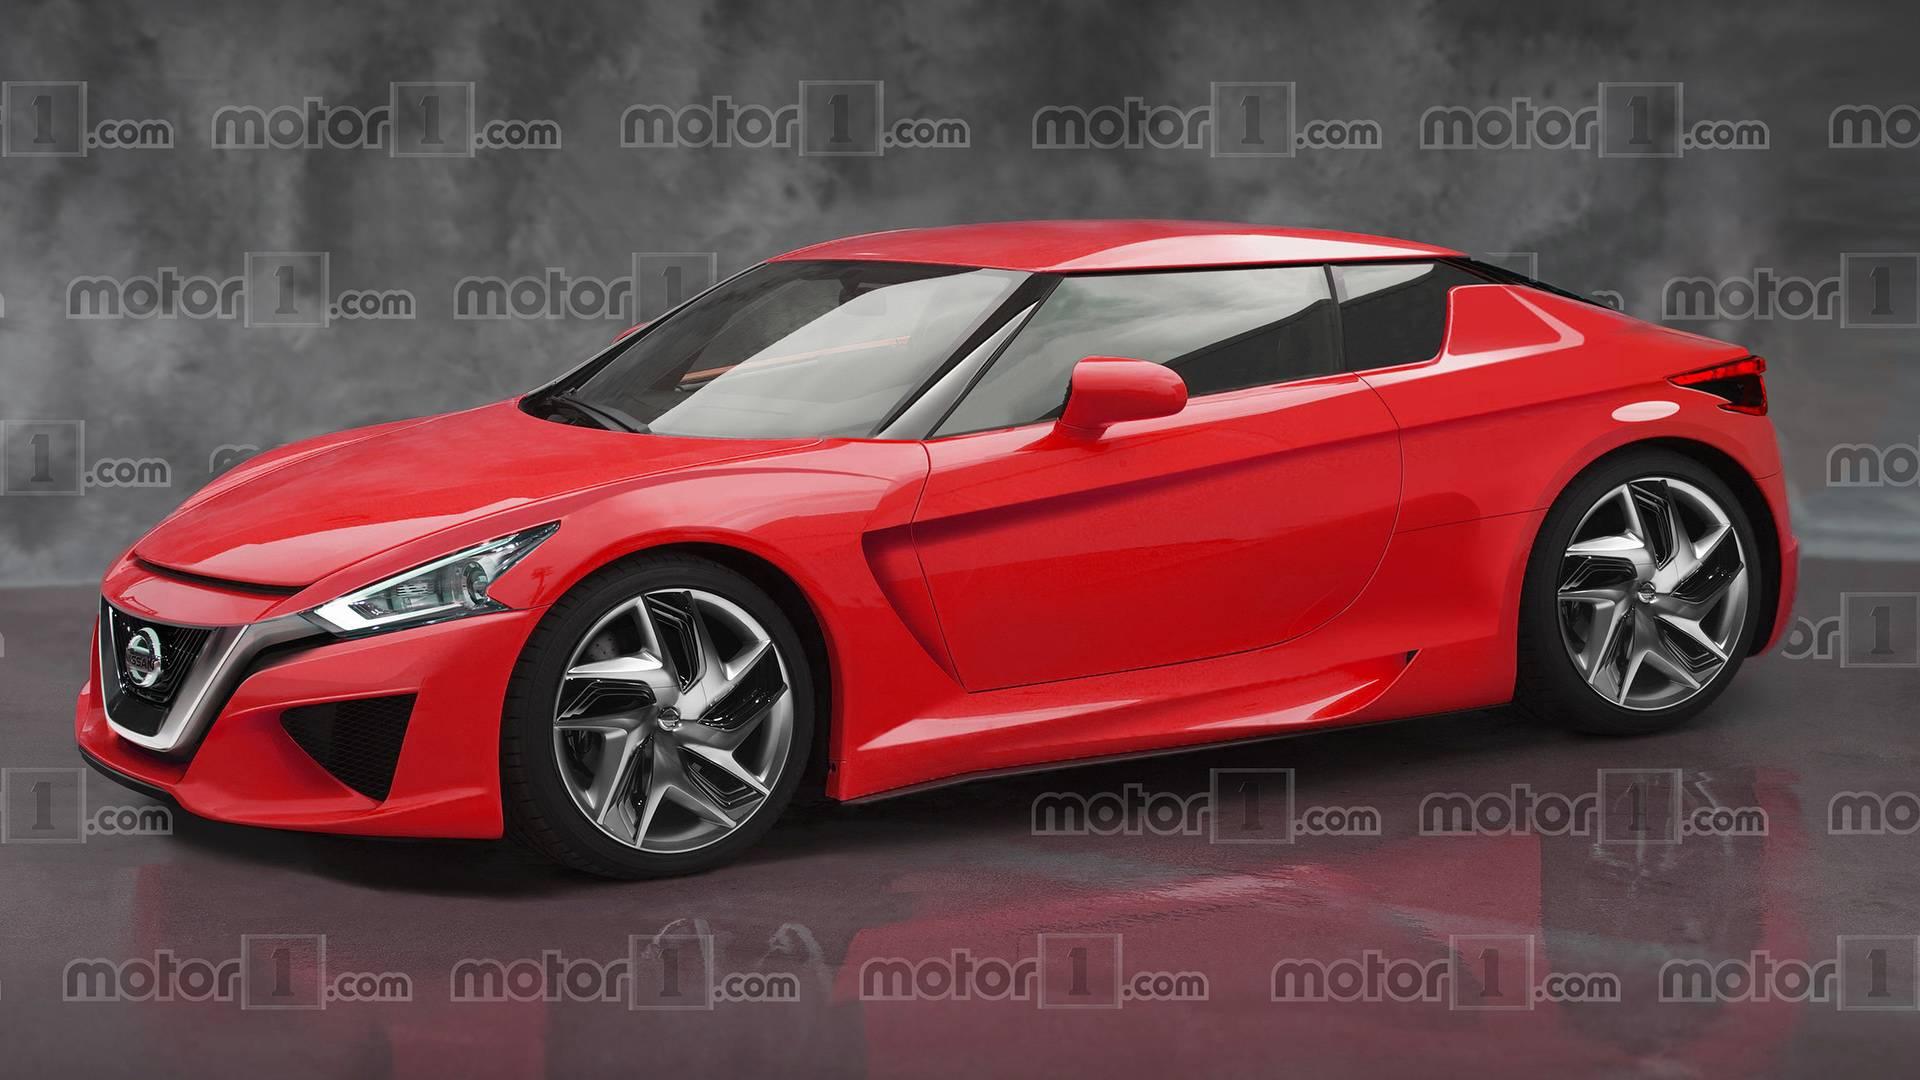 2021 Nissan Z Turbo Nismo Release Date